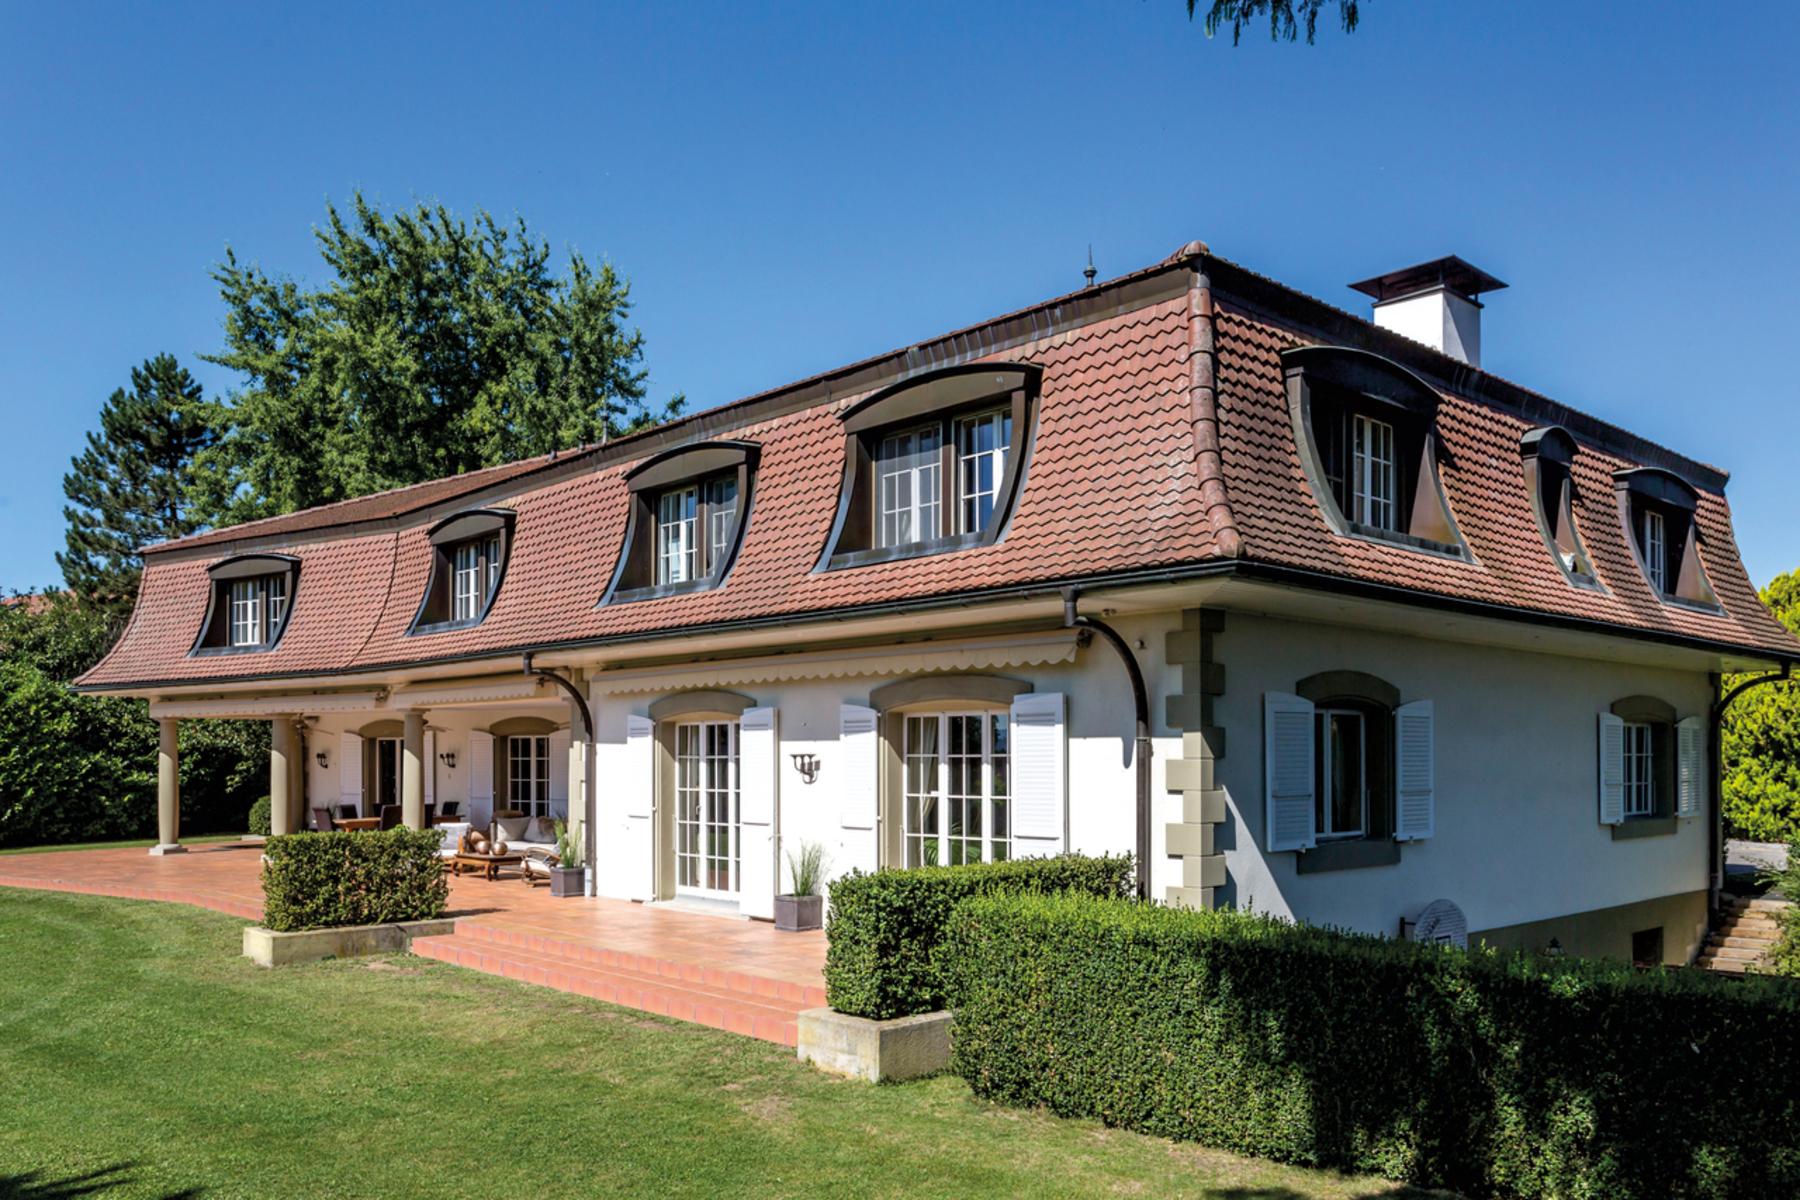 Single Family Home for Sale at Prestigious mansion on the edge of town Neyruz Neyruz, Fribourg, 1740 Switzerland